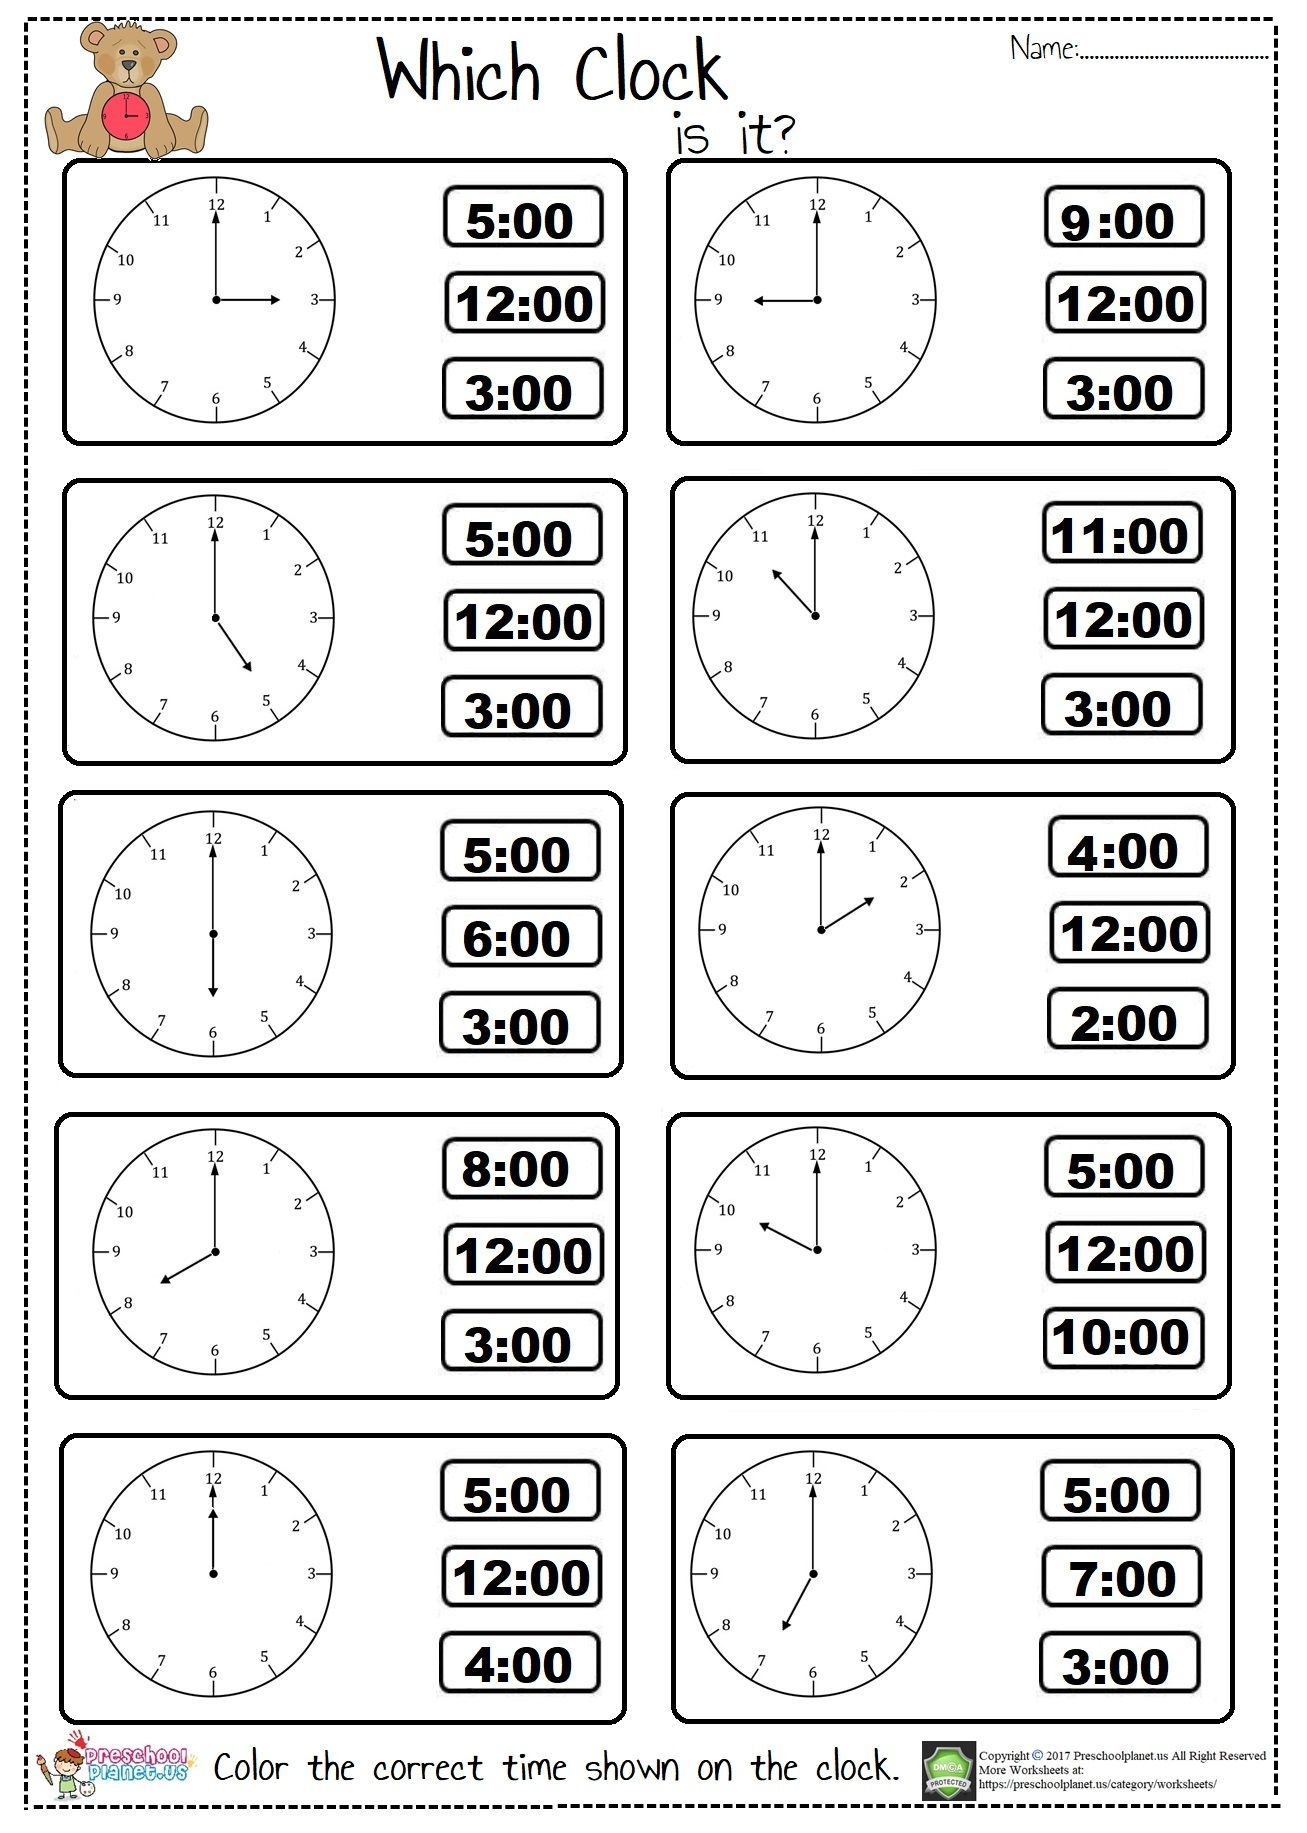 Gingerbread trace worksheets – Preschoolplanet   Time worksheets [ 1833 x 1307 Pixel ]